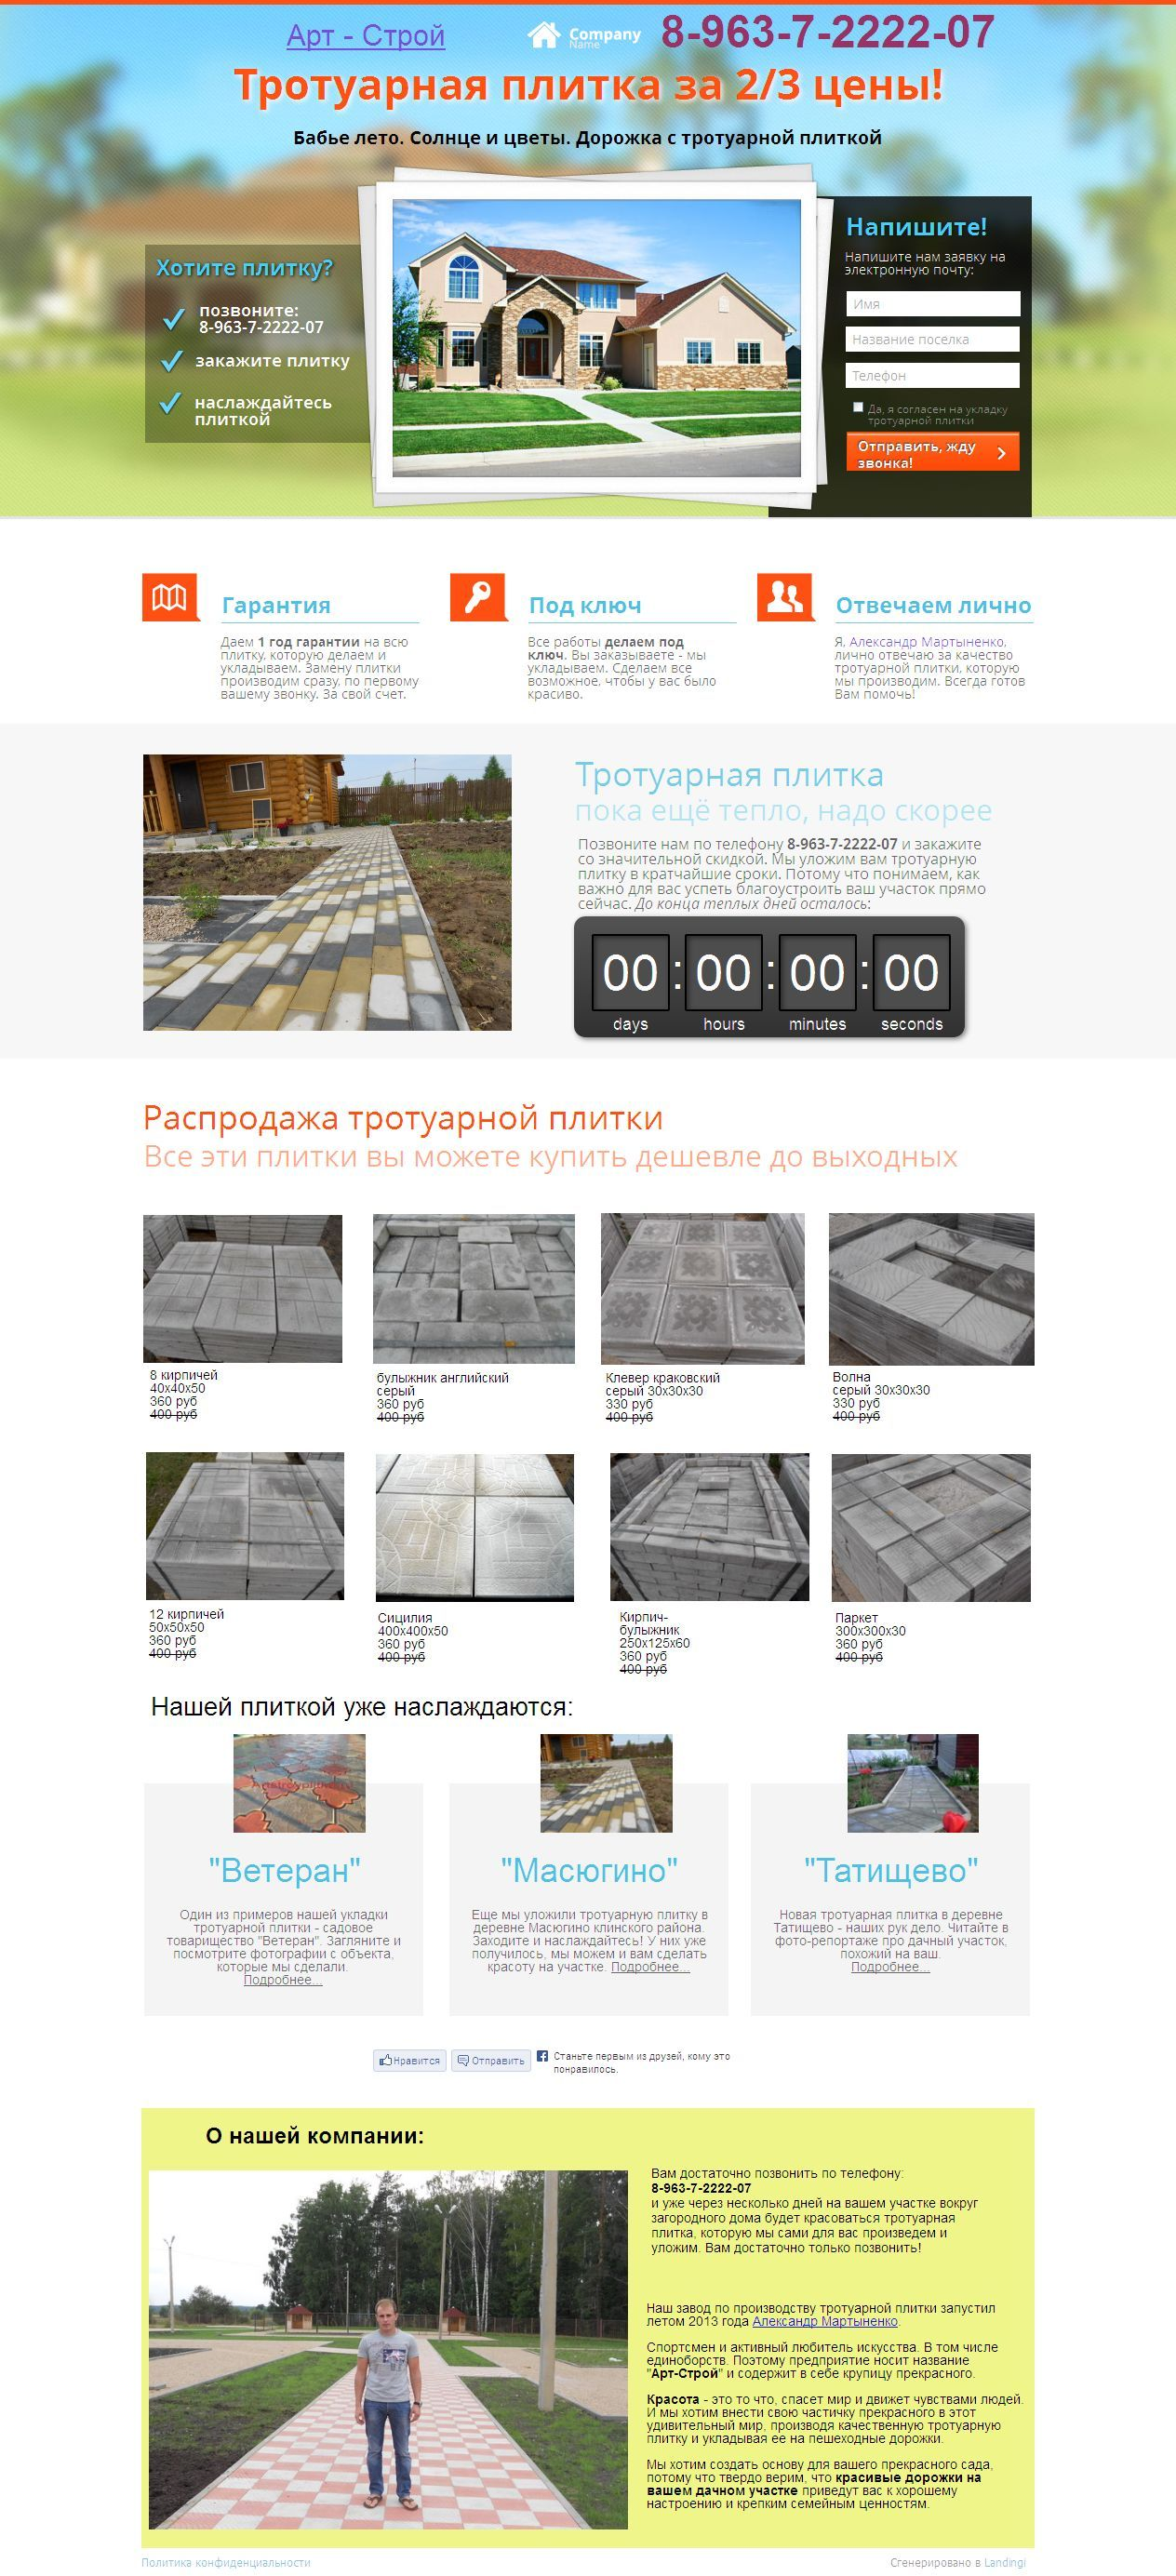 Artstroyplitka.ru - Тротуарная плитка за 2/3 цены